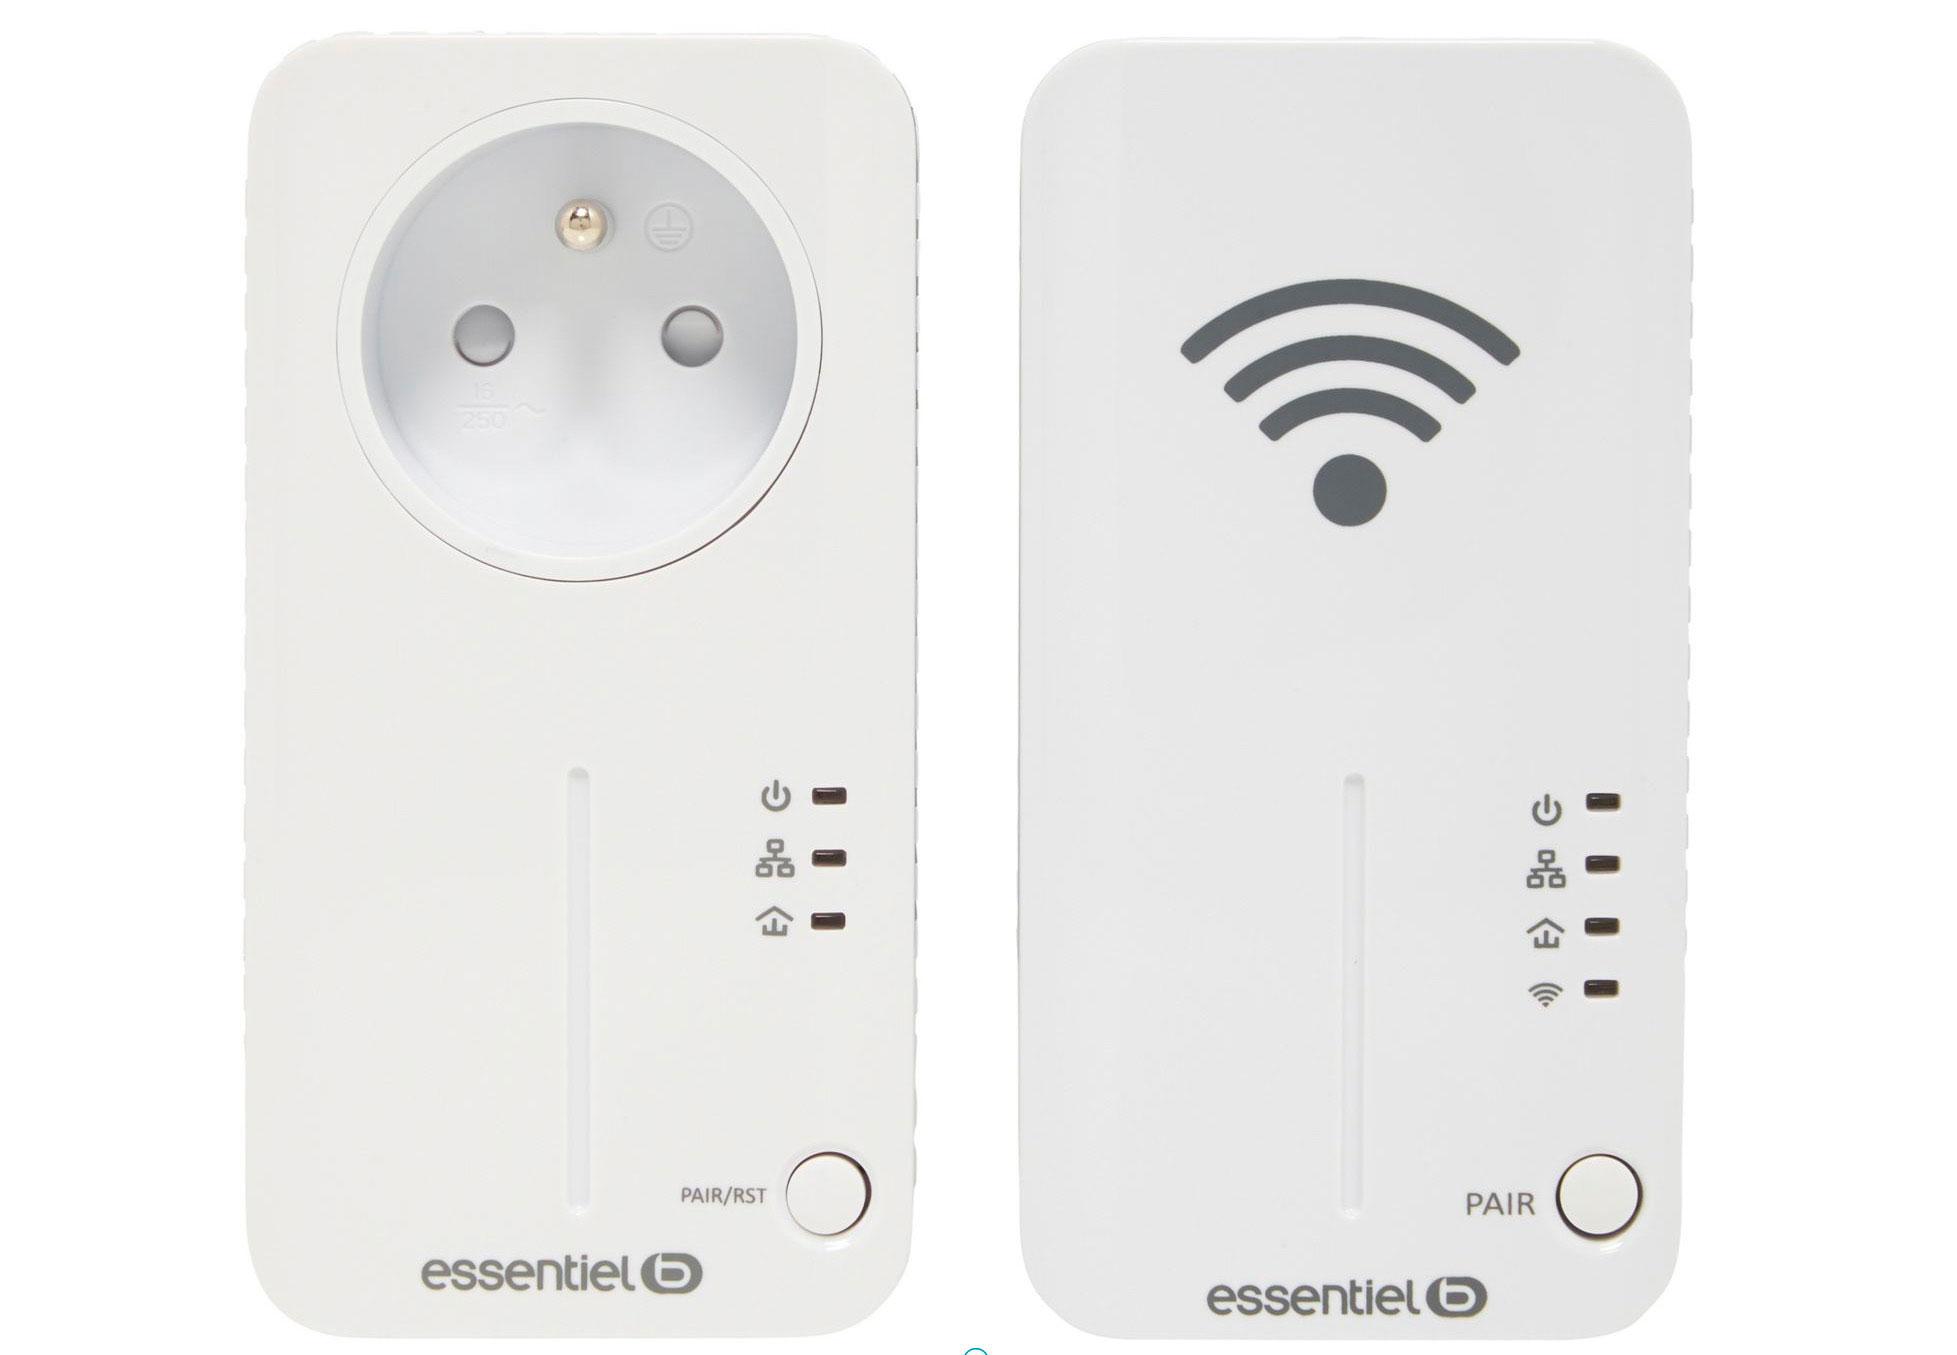 Les boîtiers CPL Essentielb WiFi 500+ Duo